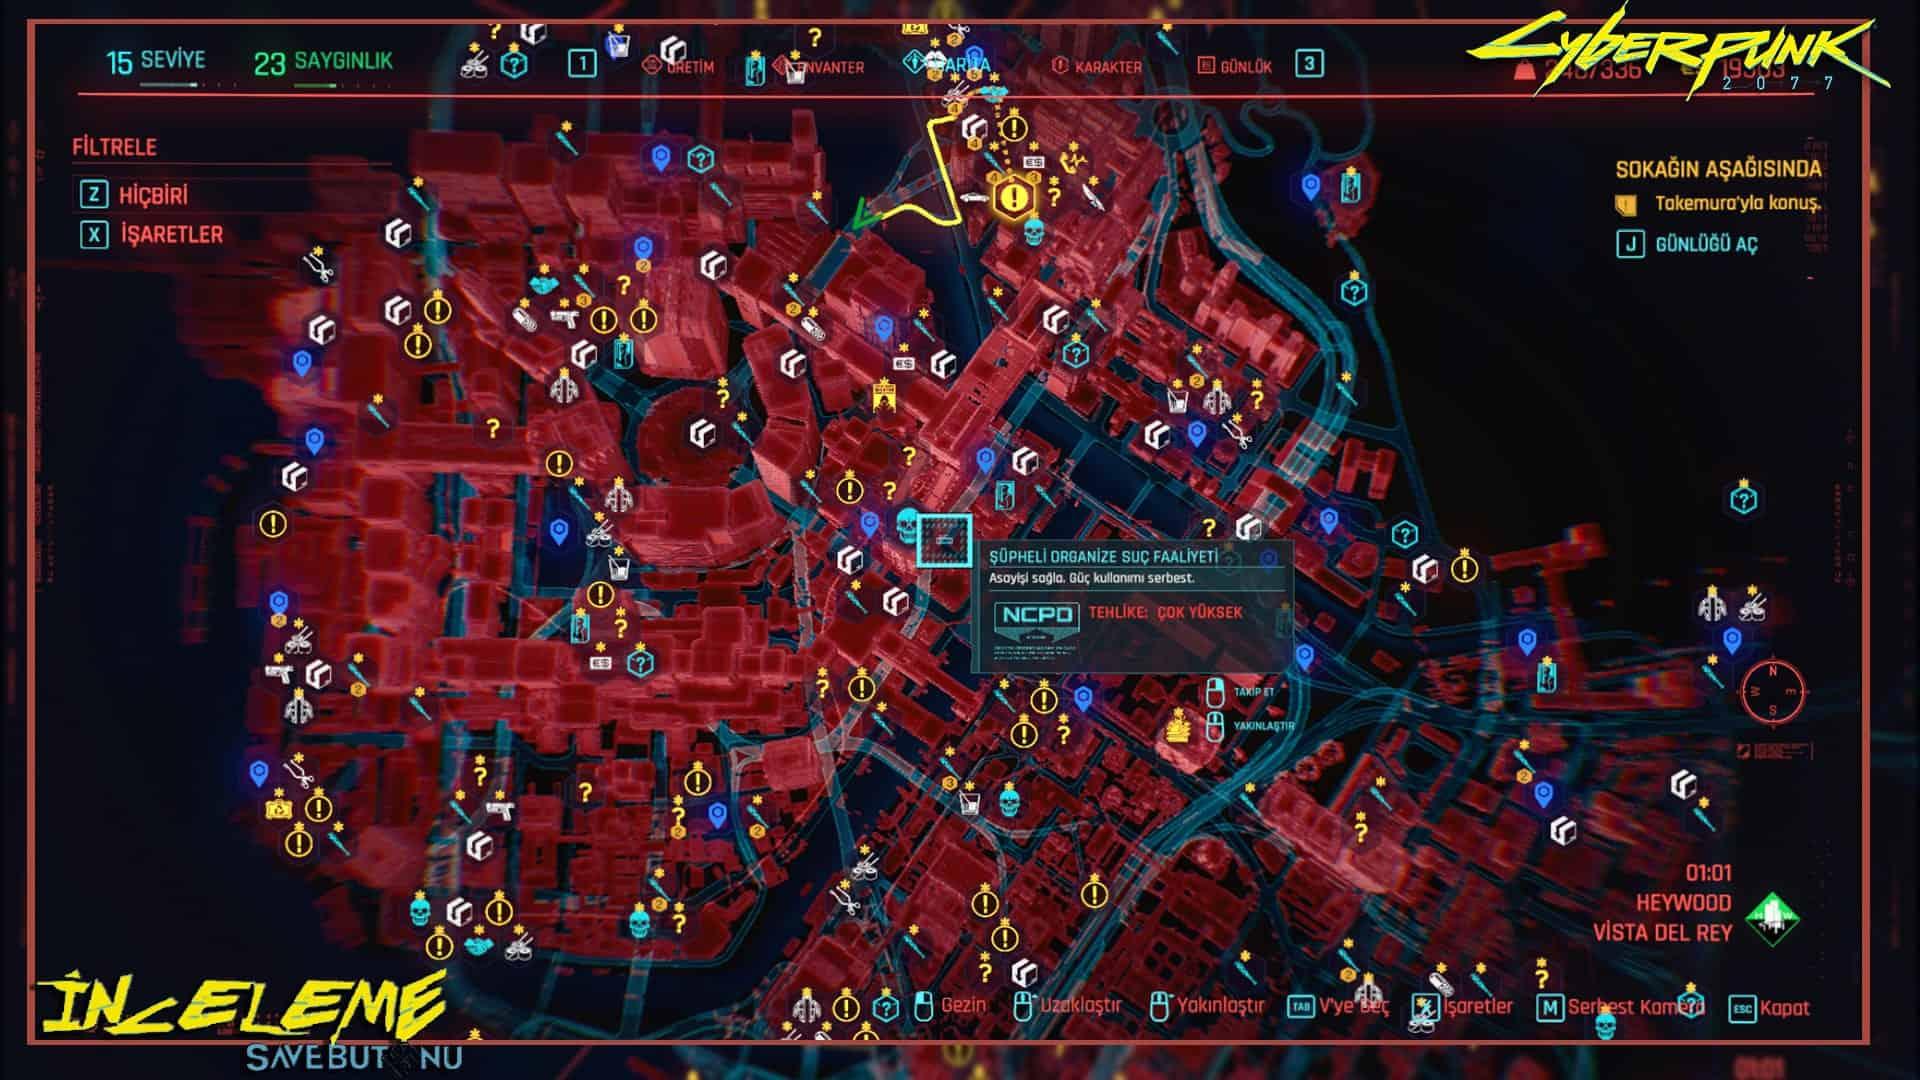 cyberpunk 2077 inceleme